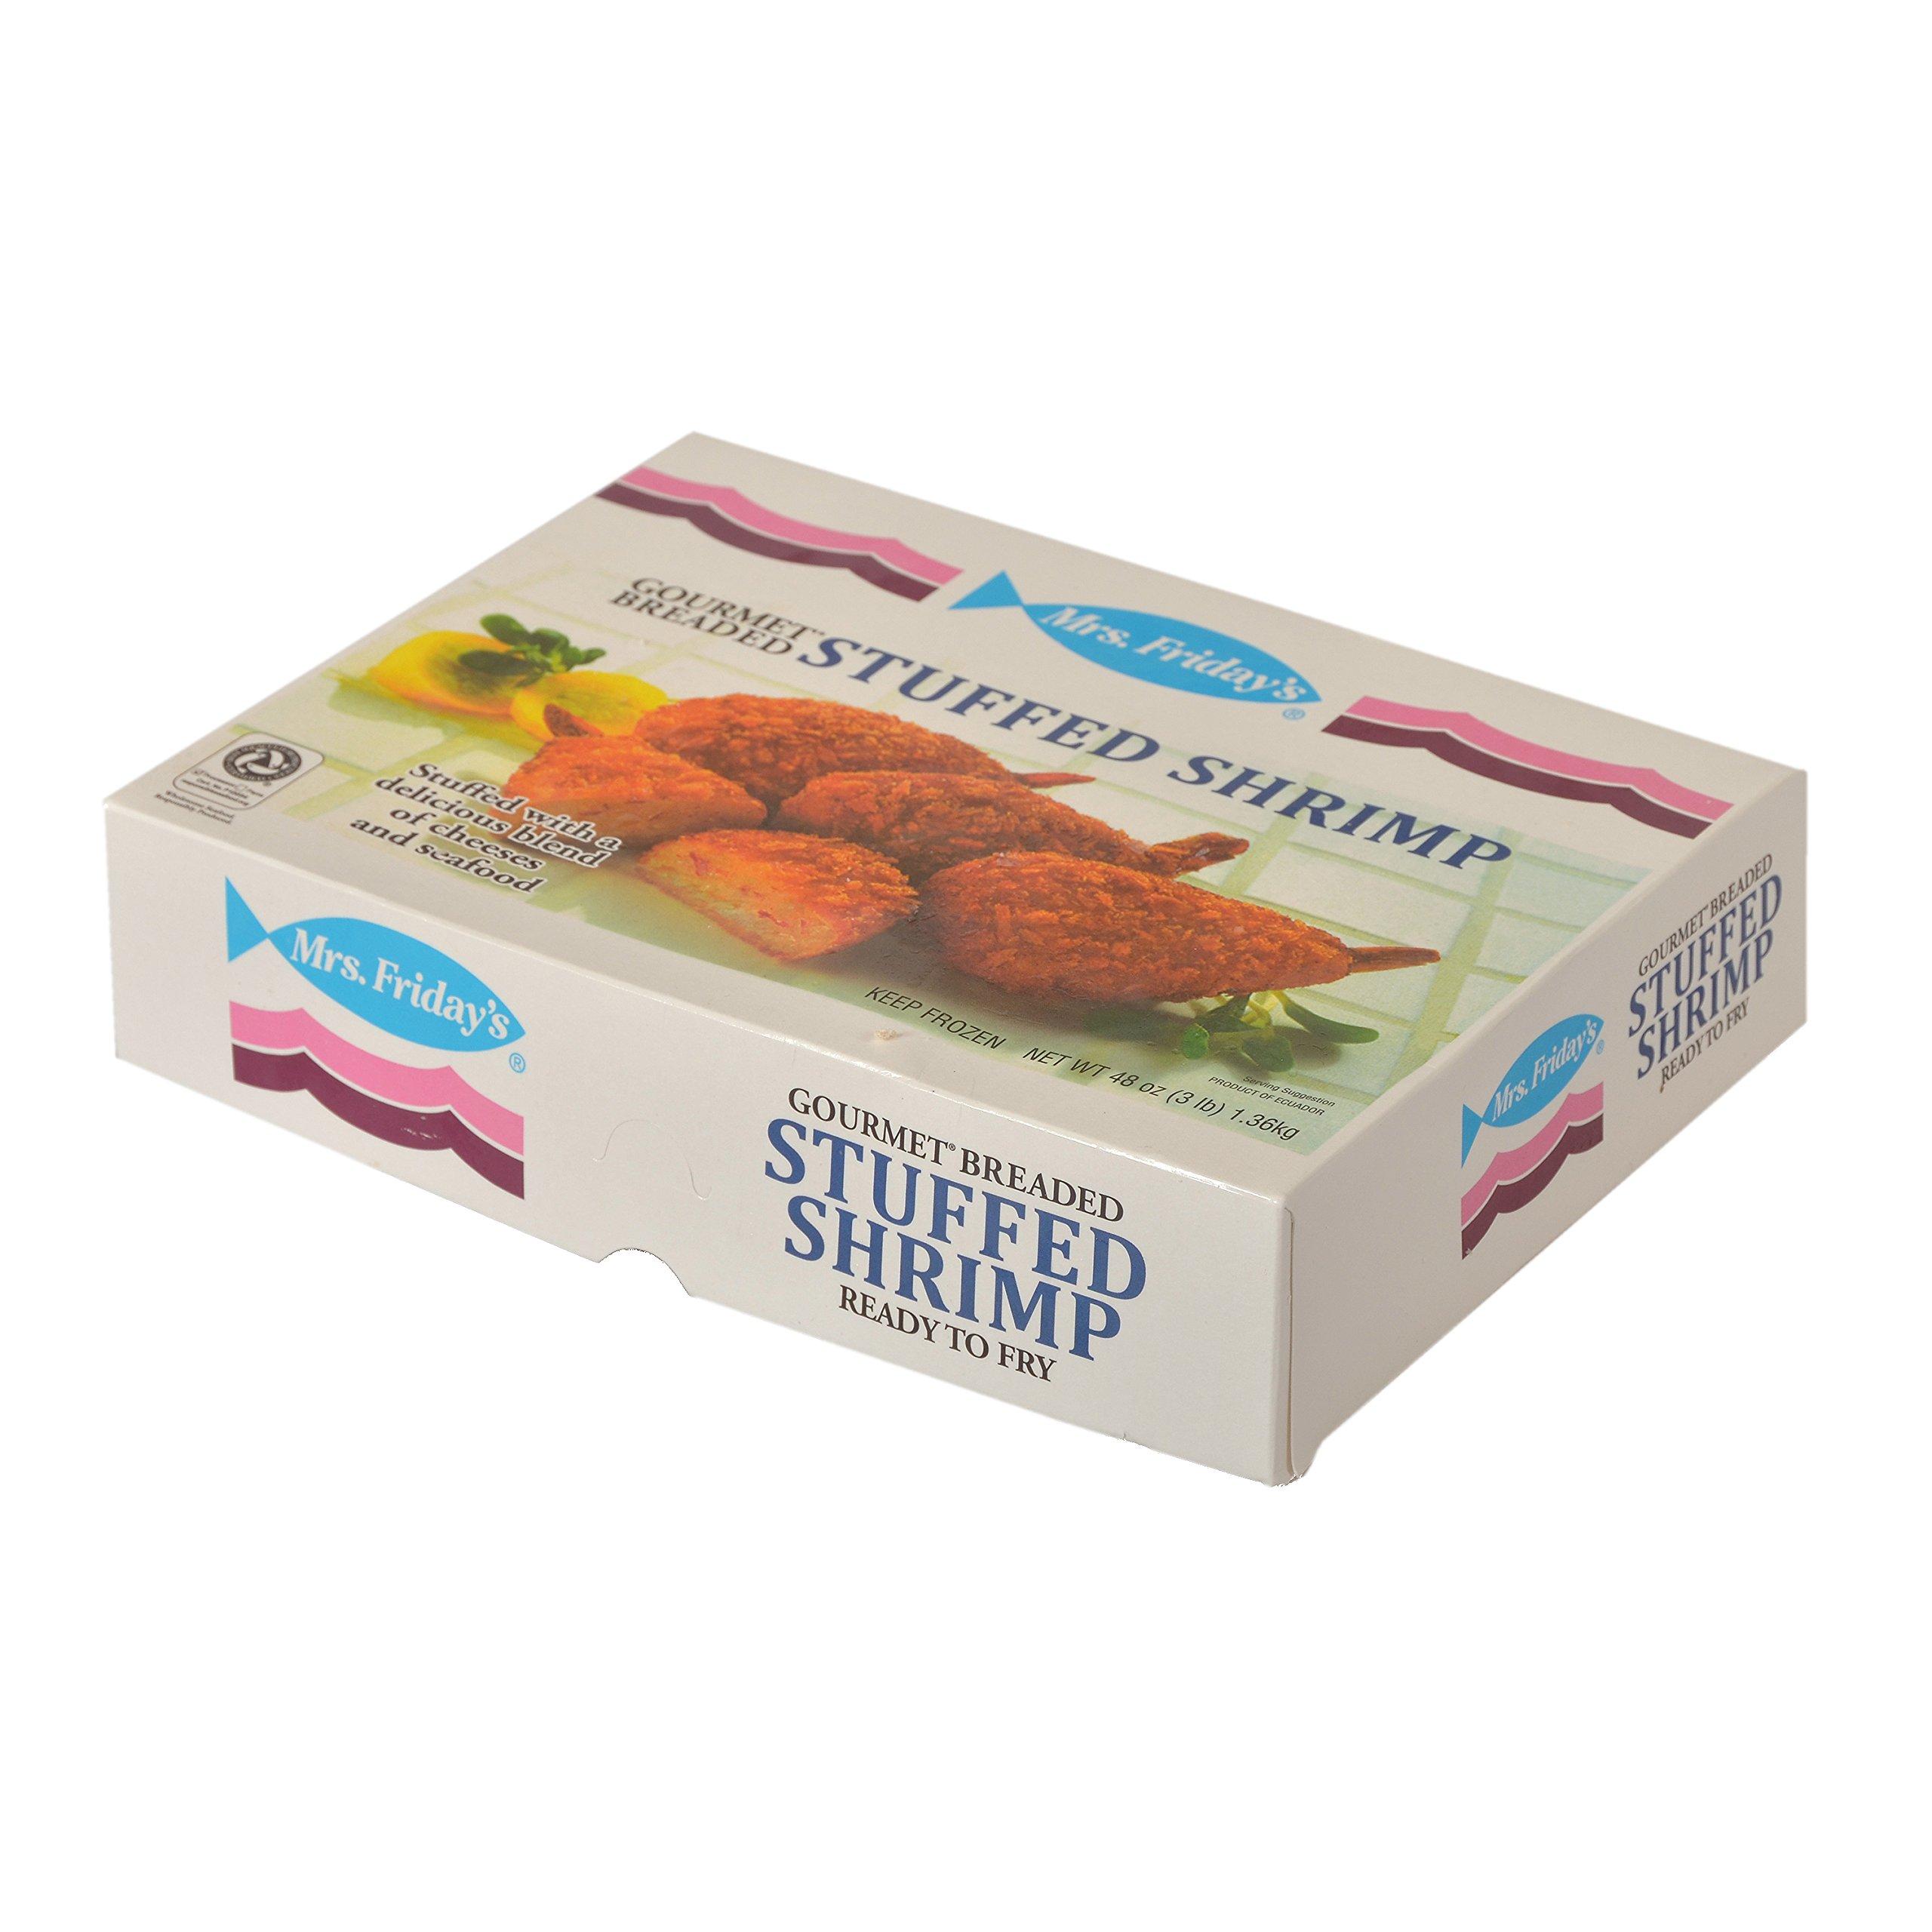 Mrs. Friday's Panko Breaded Stuffed Shrimp, 3 lb, (4 count)